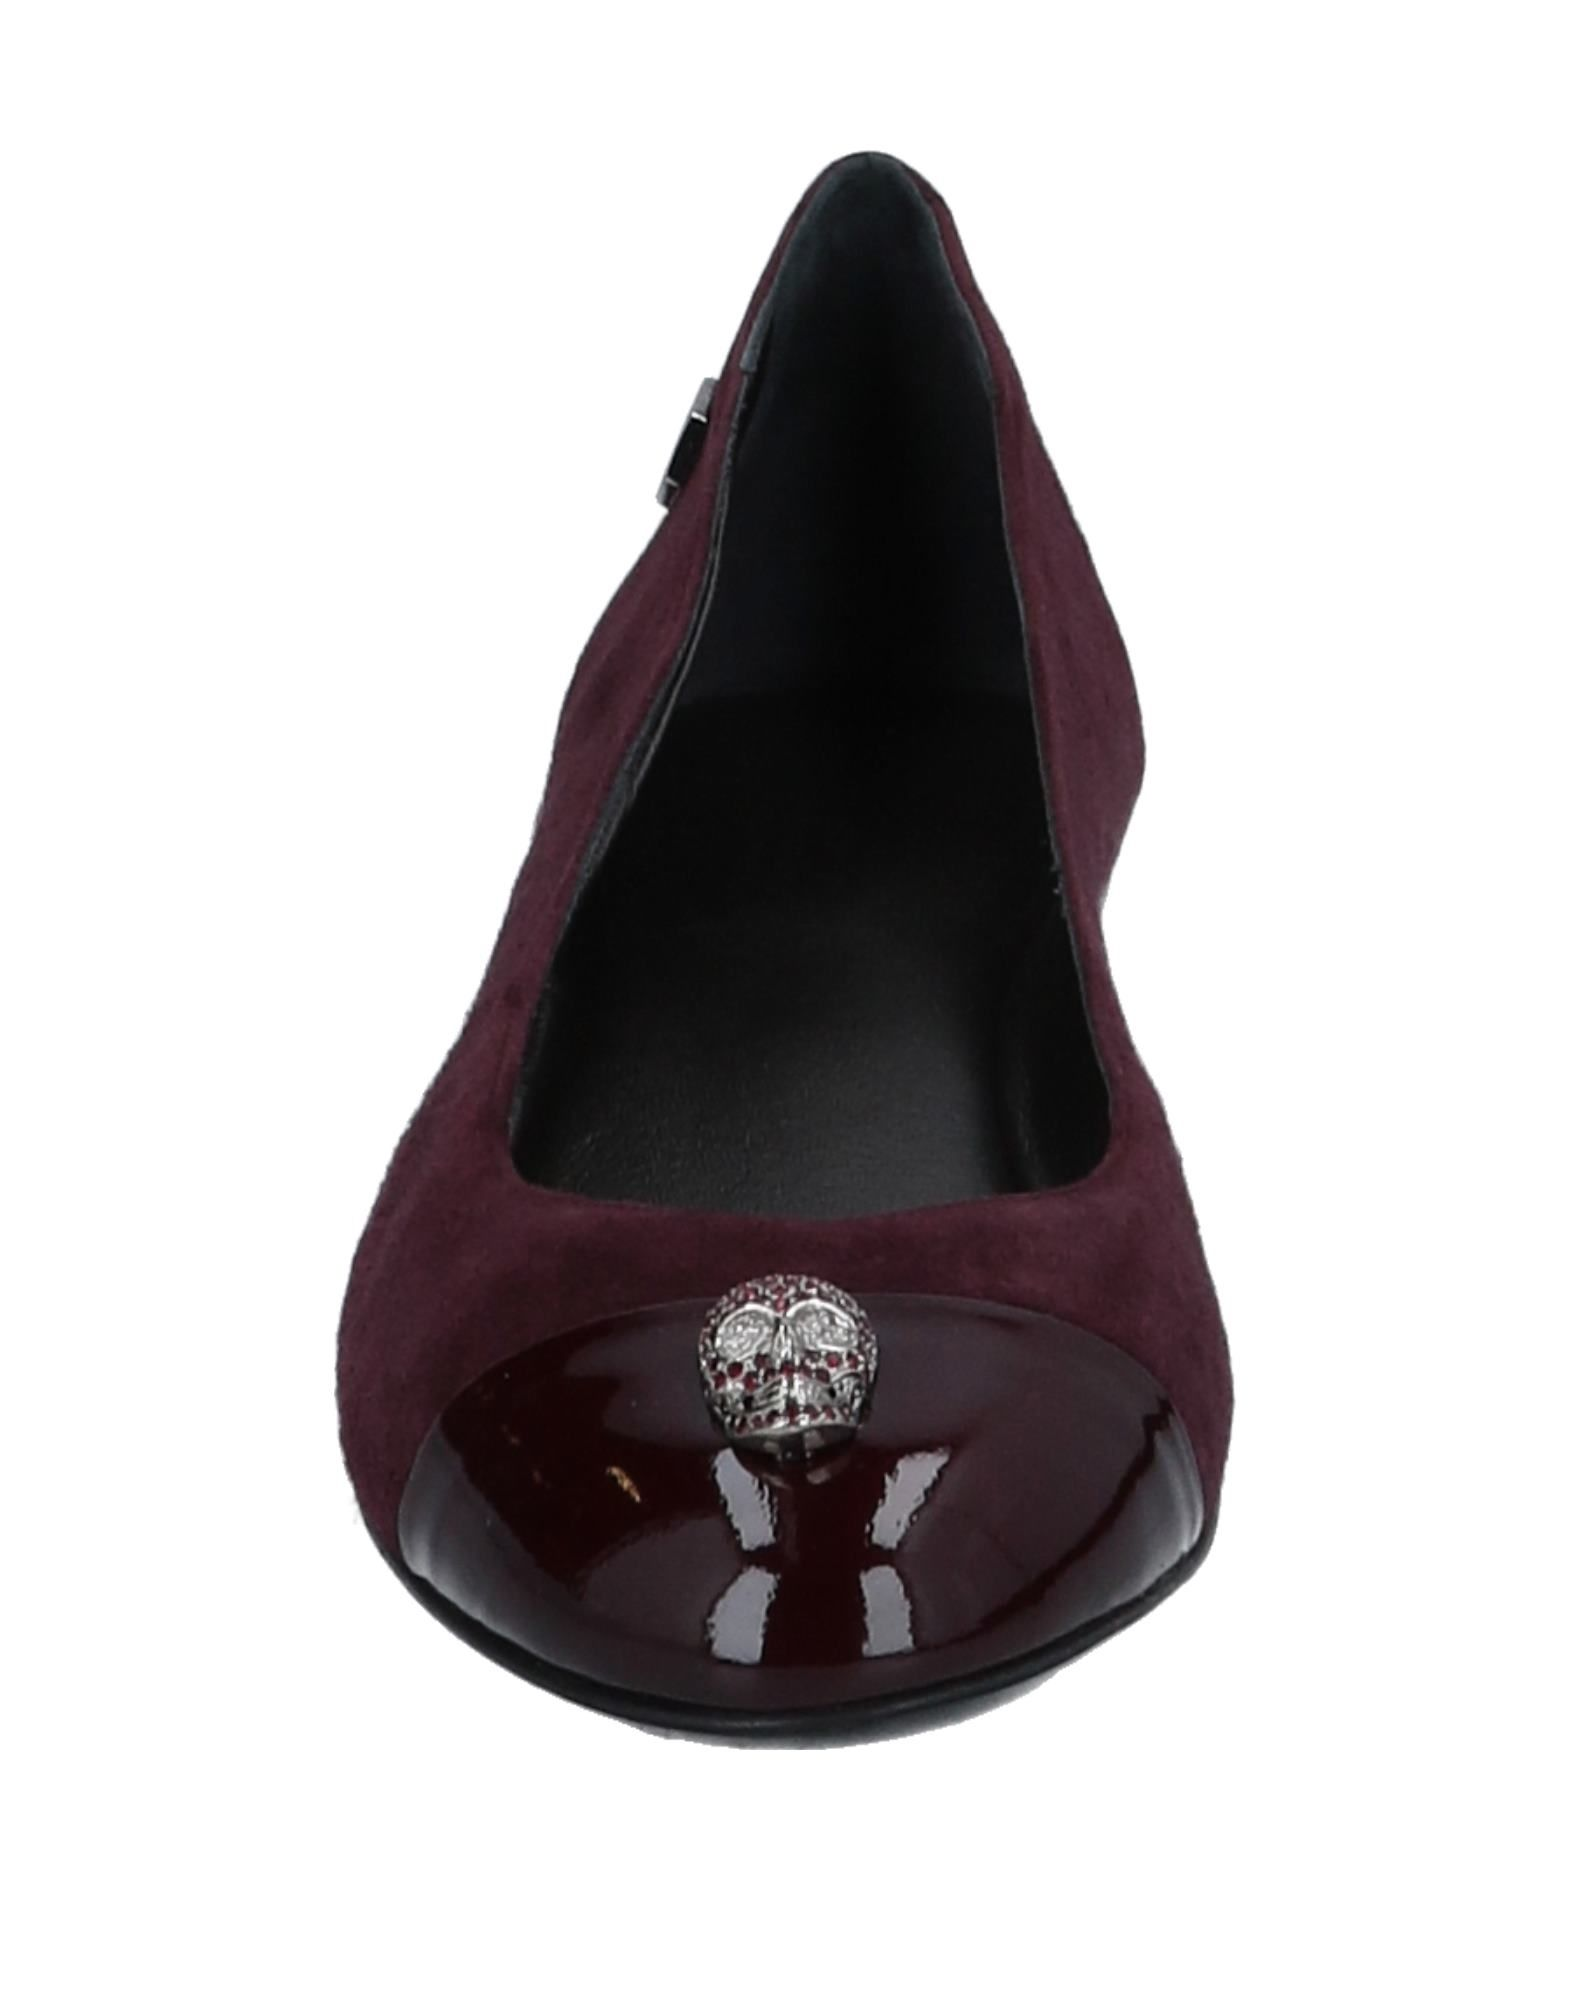 Rabatt Schuhe Ballerinas Philipp Plein Ballerinas Schuhe Damen  11543962AC c4fde1